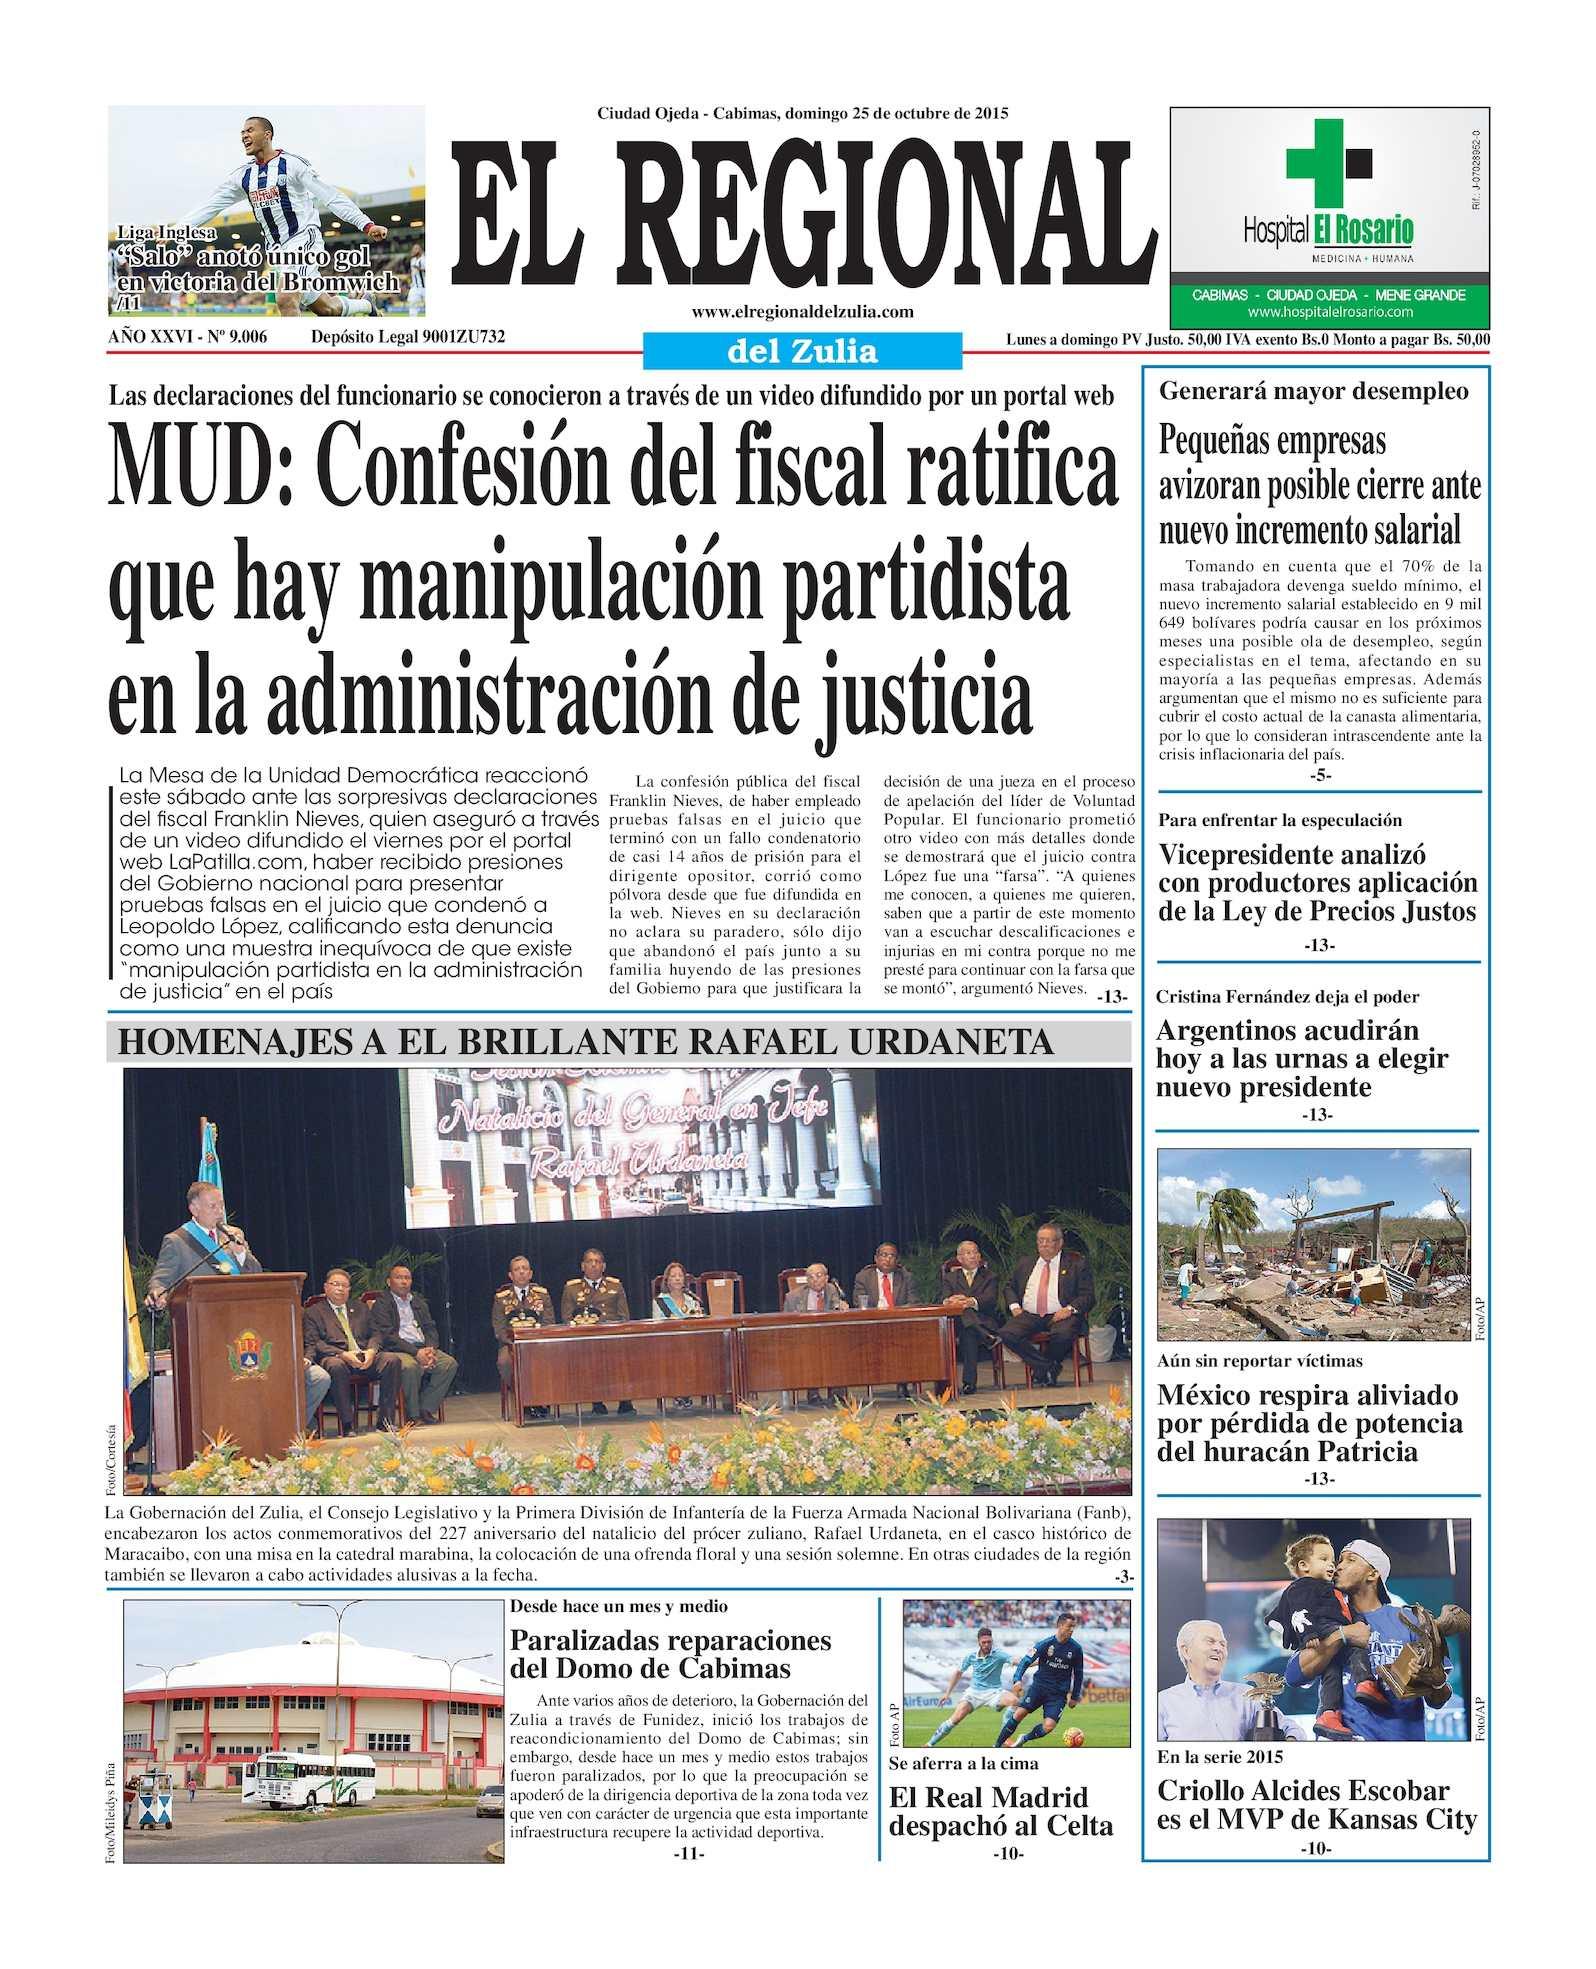 Calaméo - El Regional del Zulia 25-10-2015